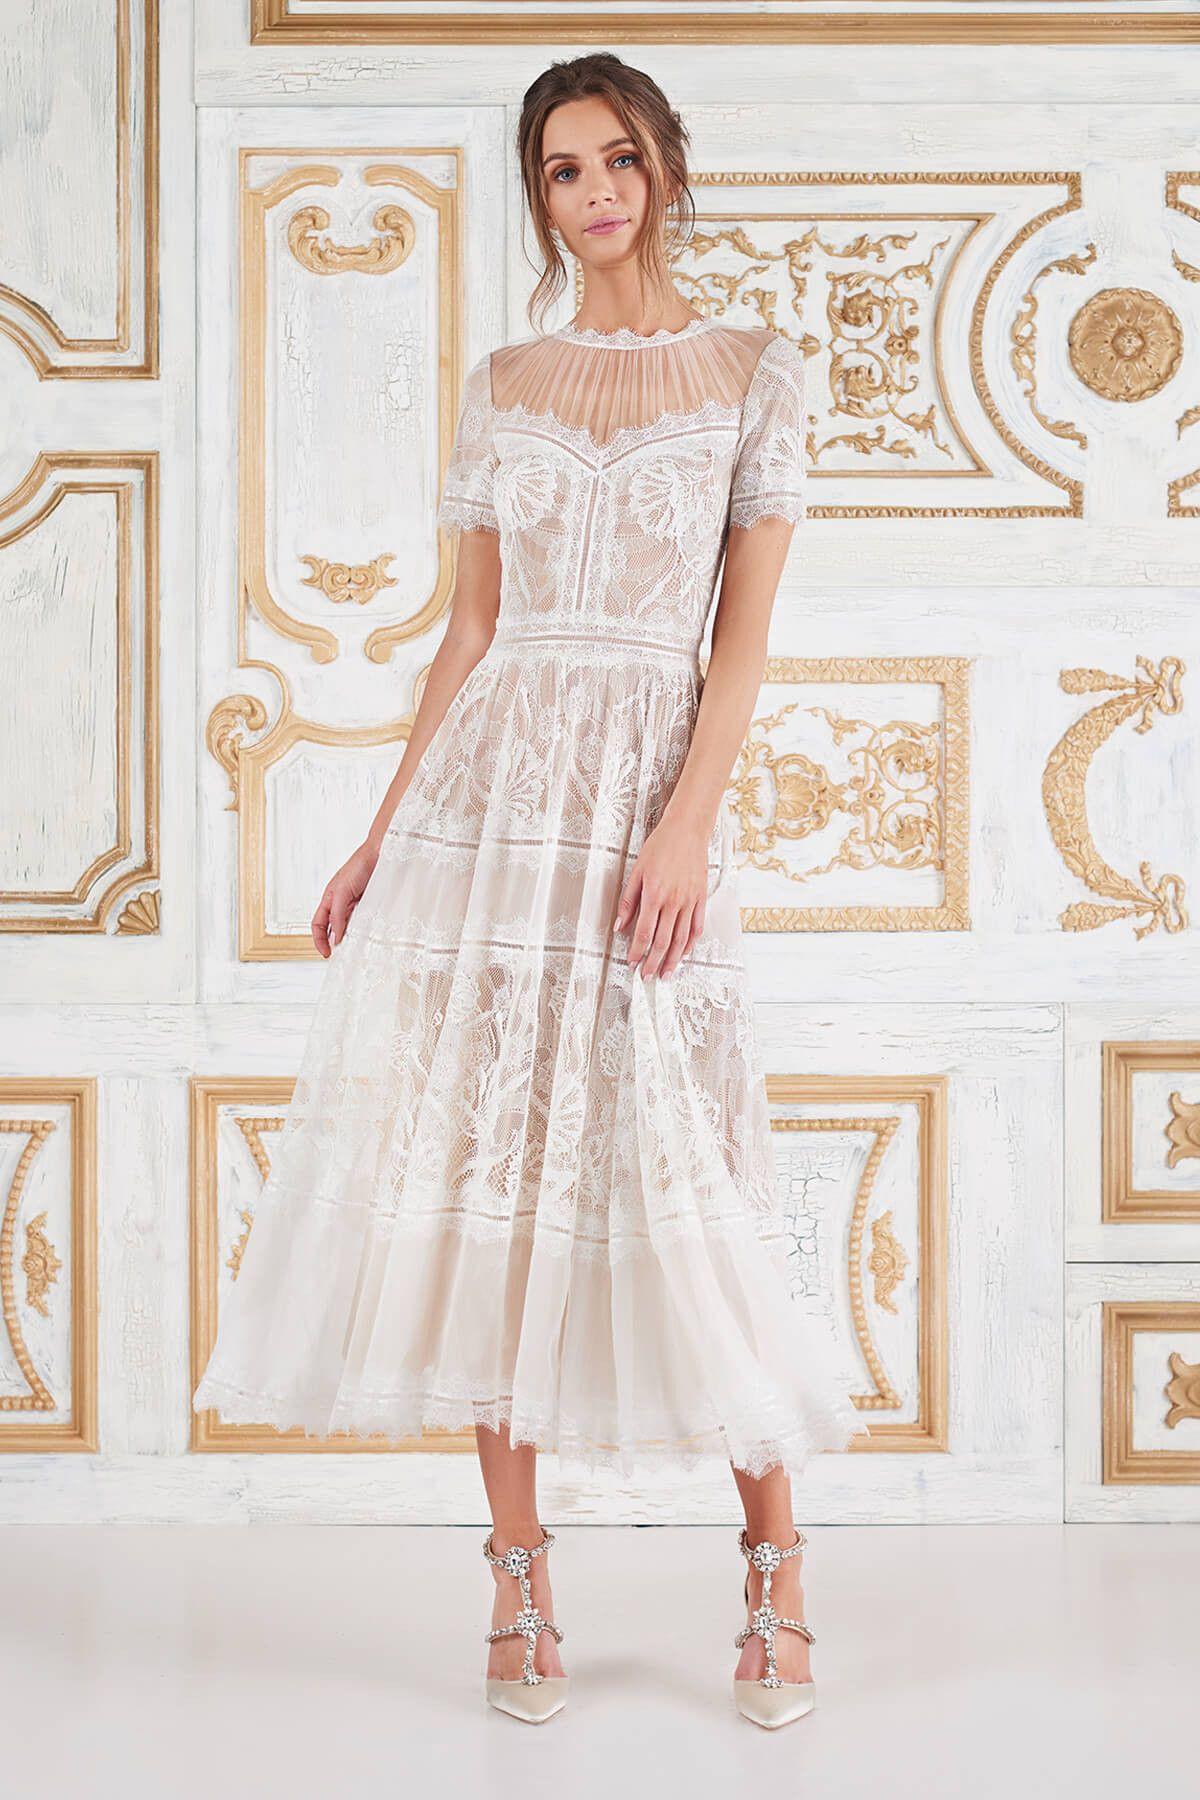 eae66d4035def Tadashi Shoji - Camilla Tea-Length Dress | Something borrowed ...